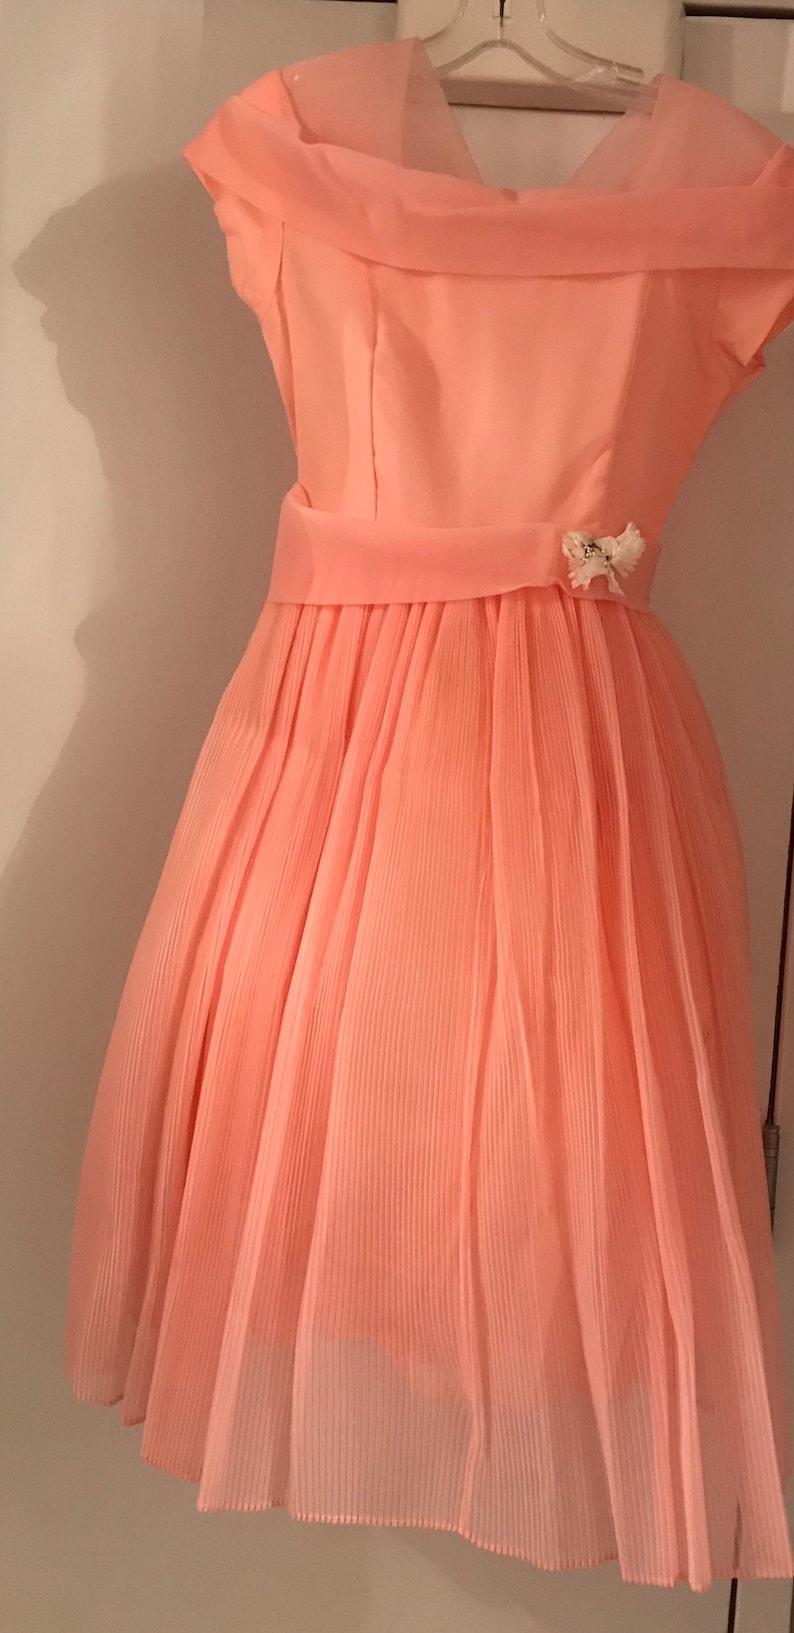 306af9aad083 Vintage 1962 Kerry Teen Sears organza dress | Etsy